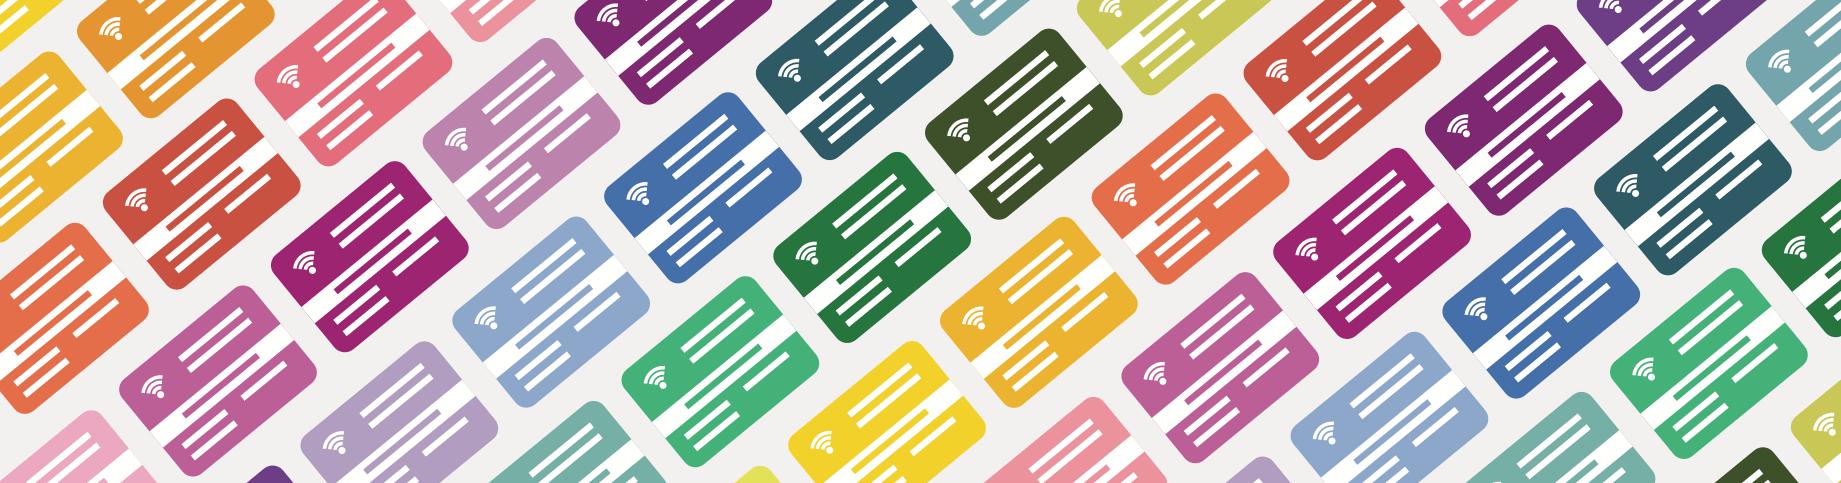 codigos de acesso customizados